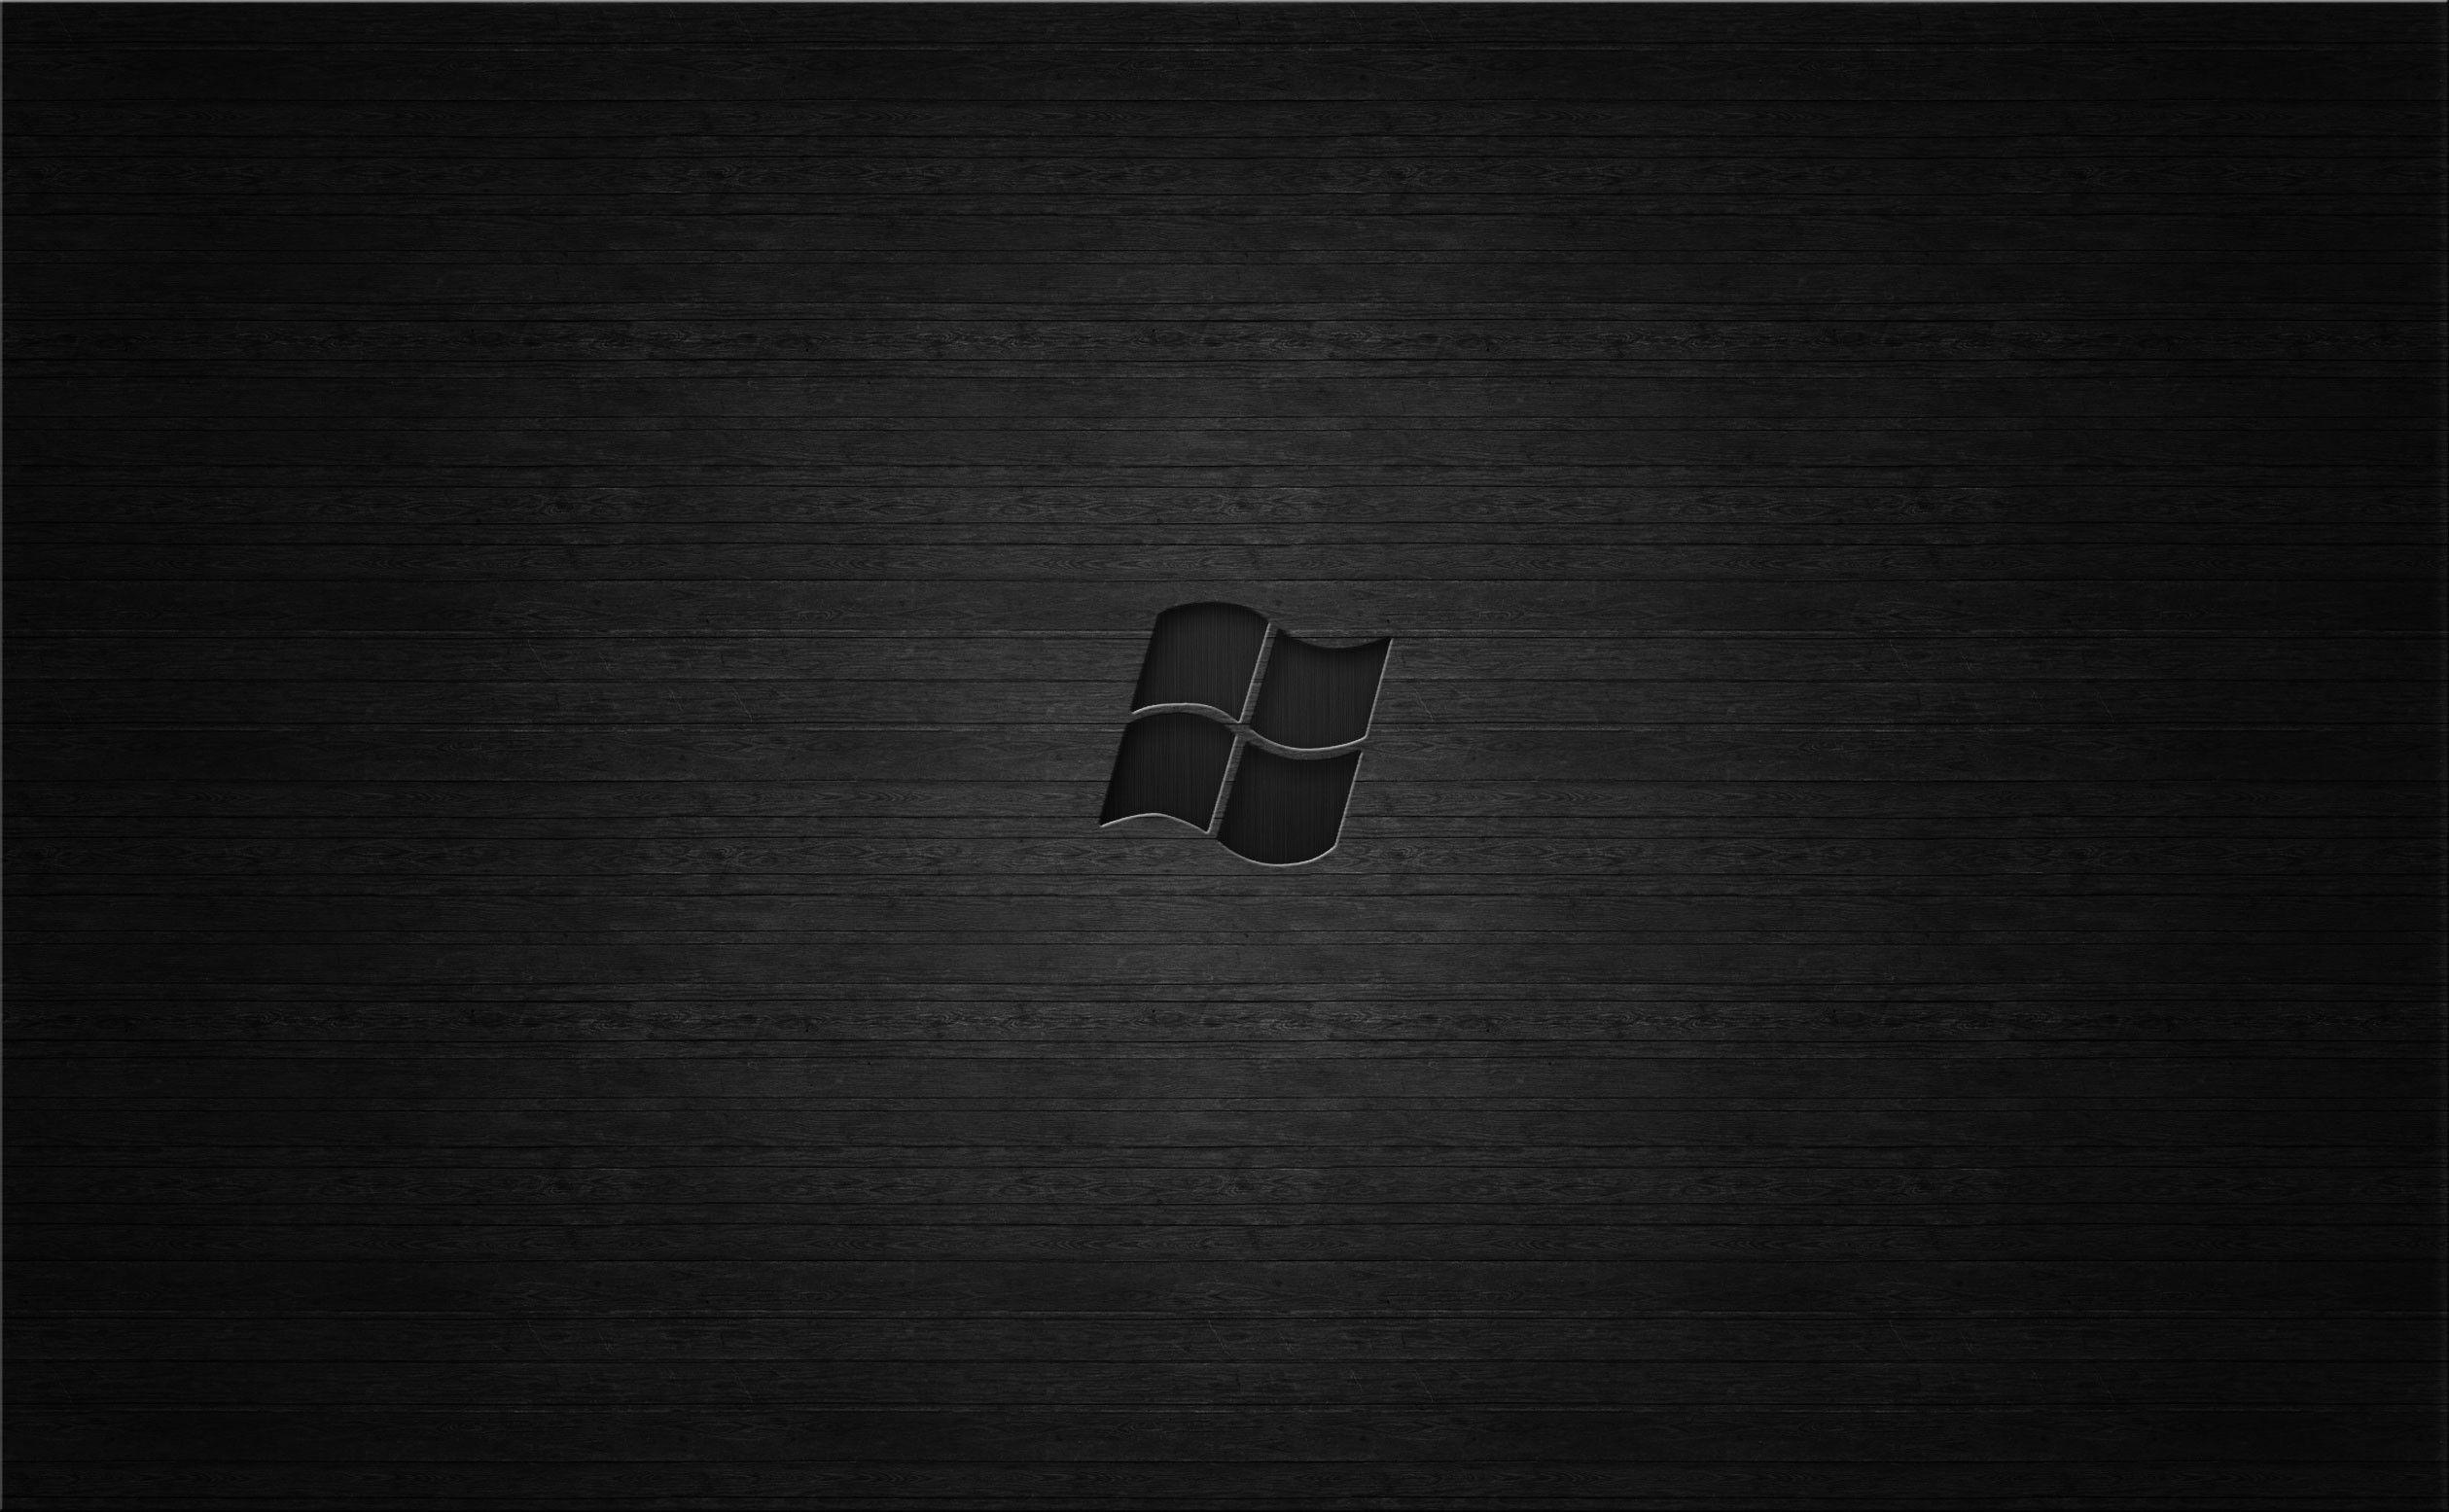 Dark Desktop Wallpaper Posted By Ryan Thompson